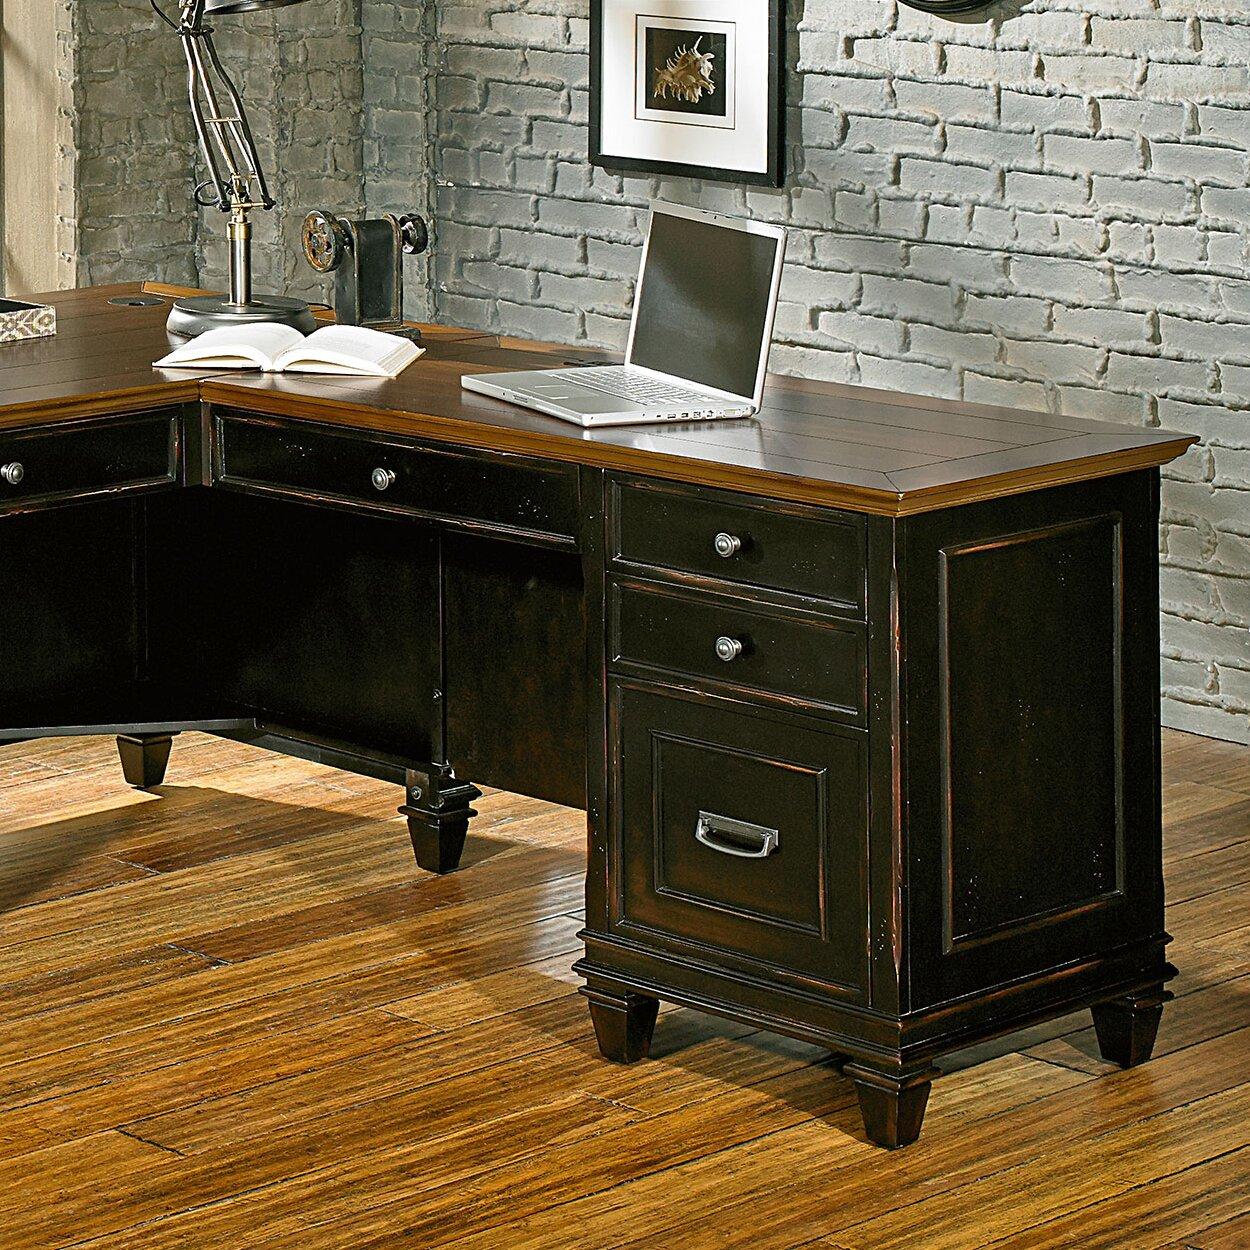 Kathy Ireland Dining Room Furniture: Kathy Ireland Home By Martin Furniture Hartford 3 Piece L